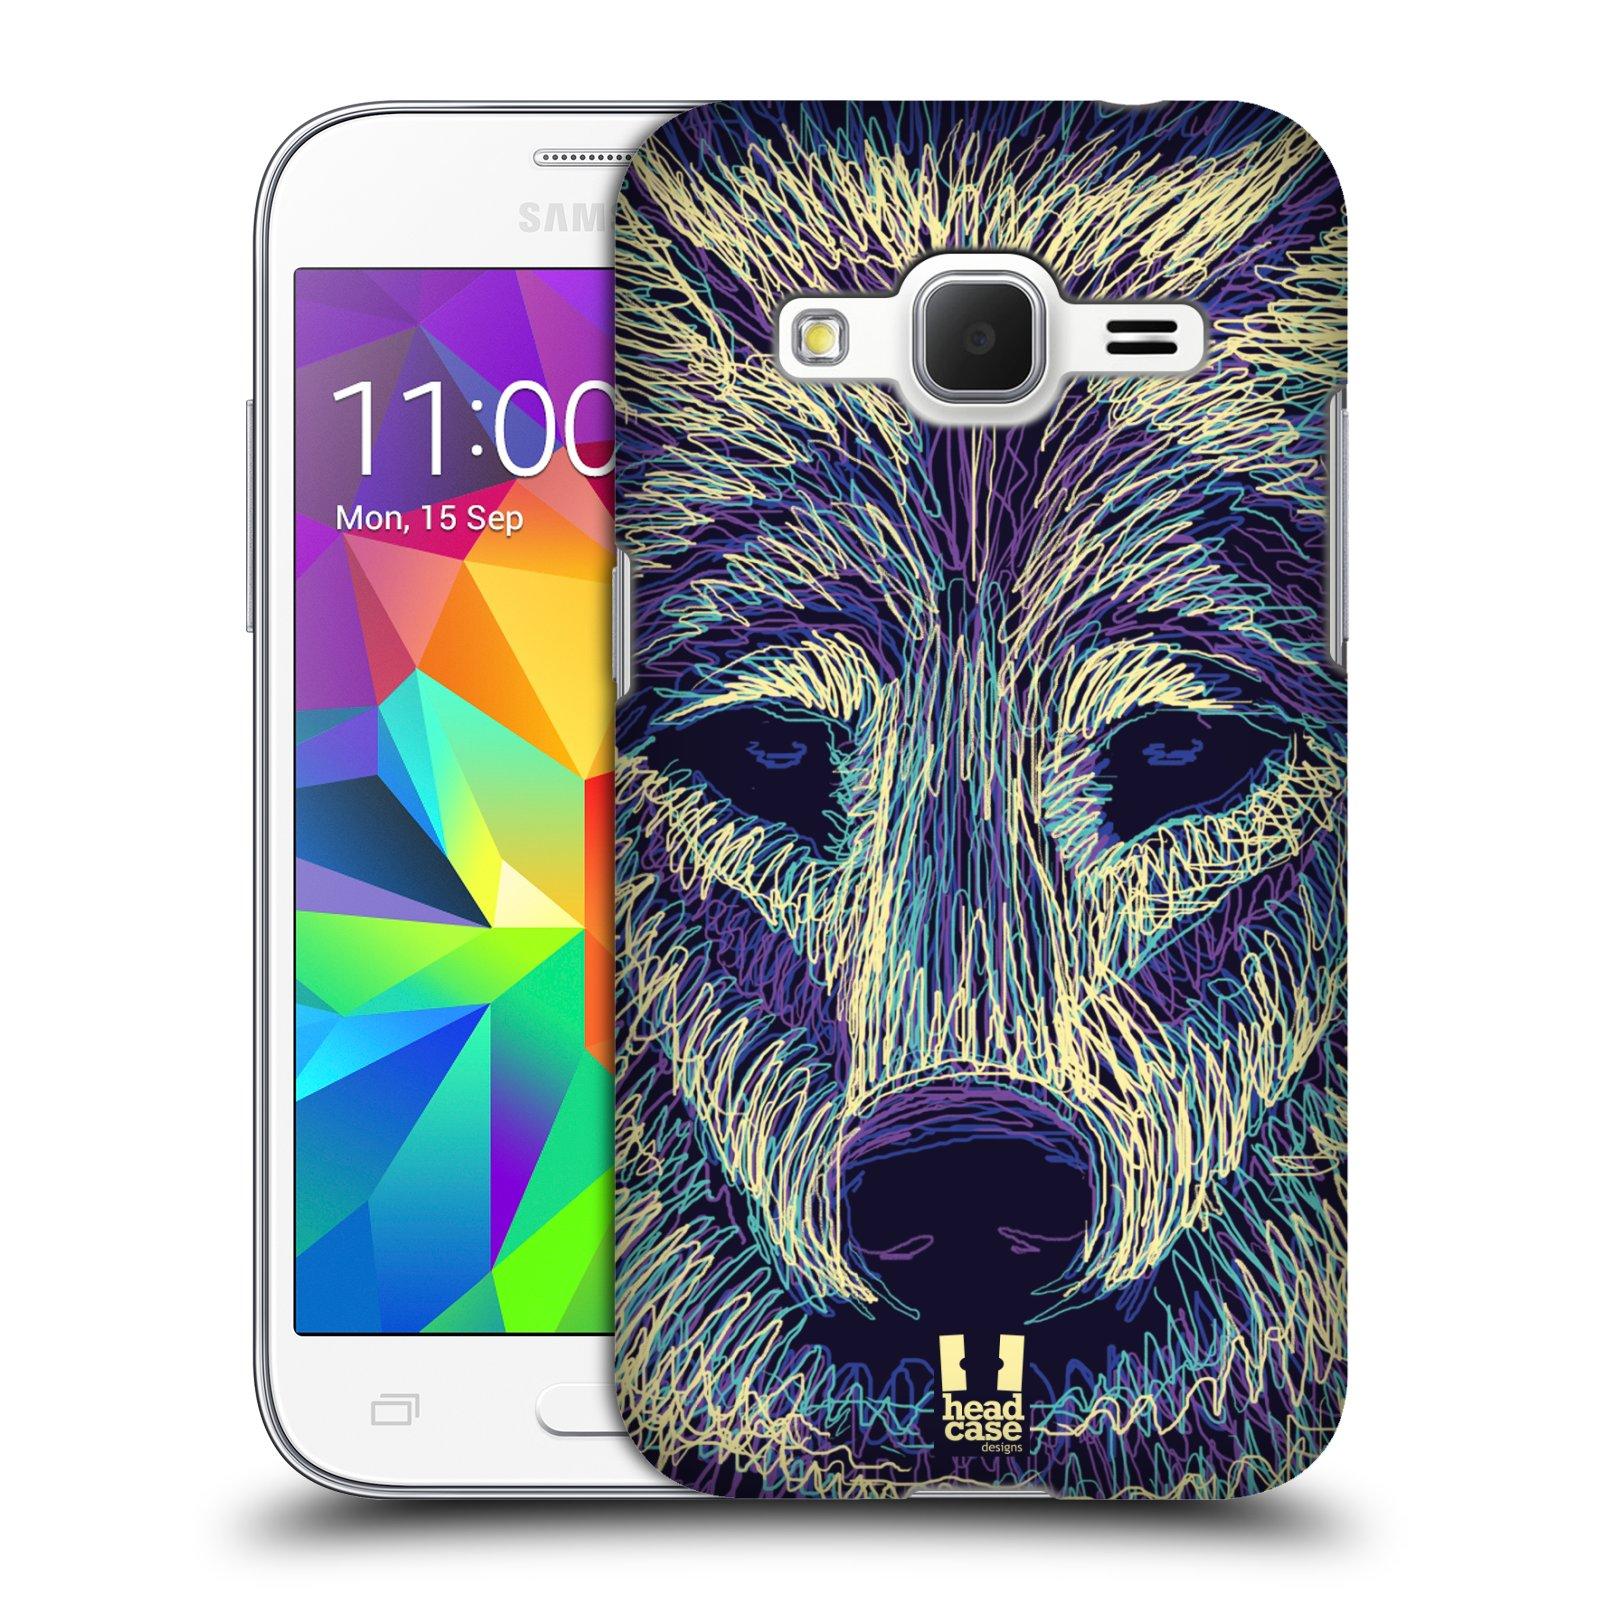 HEAD CASE plastový obal na mobil SAMSUNG GALAXY Core Prime (Core Prime VE) vzor zvíře čmáranice vlk